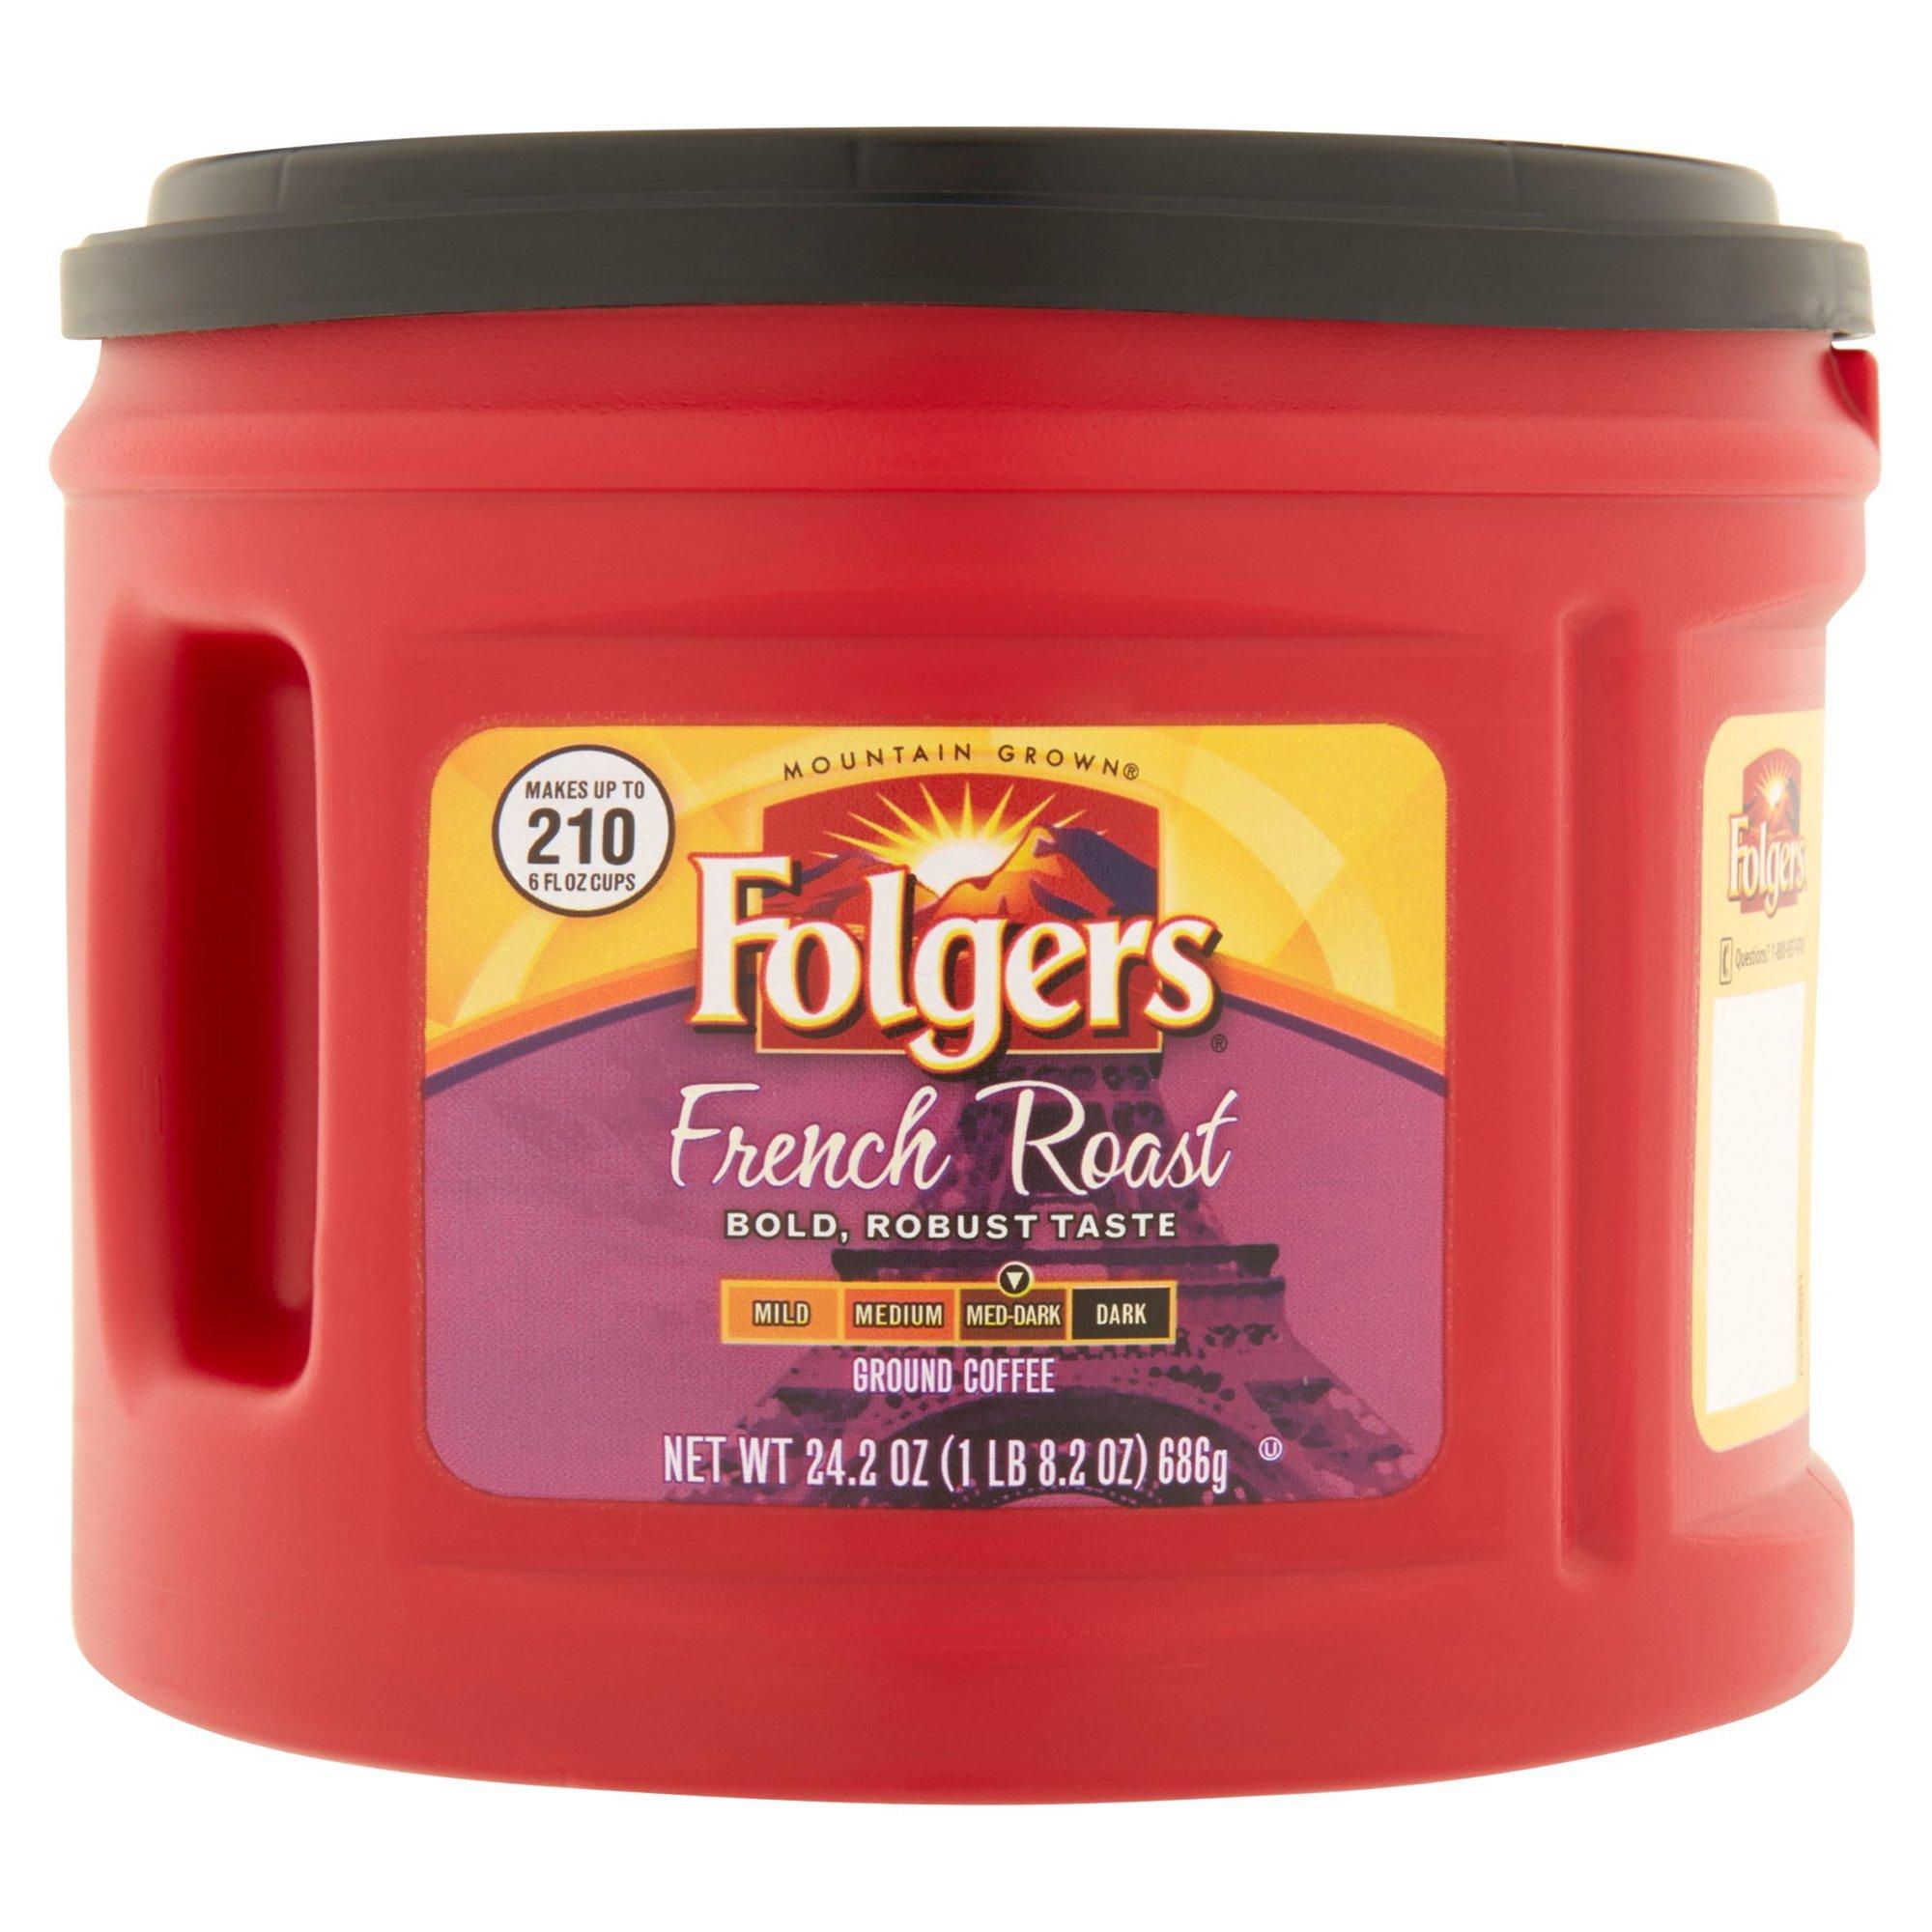 Folgers French Medium Dark Roast Ground Coffee, 24.2 oz (Pack of 5)